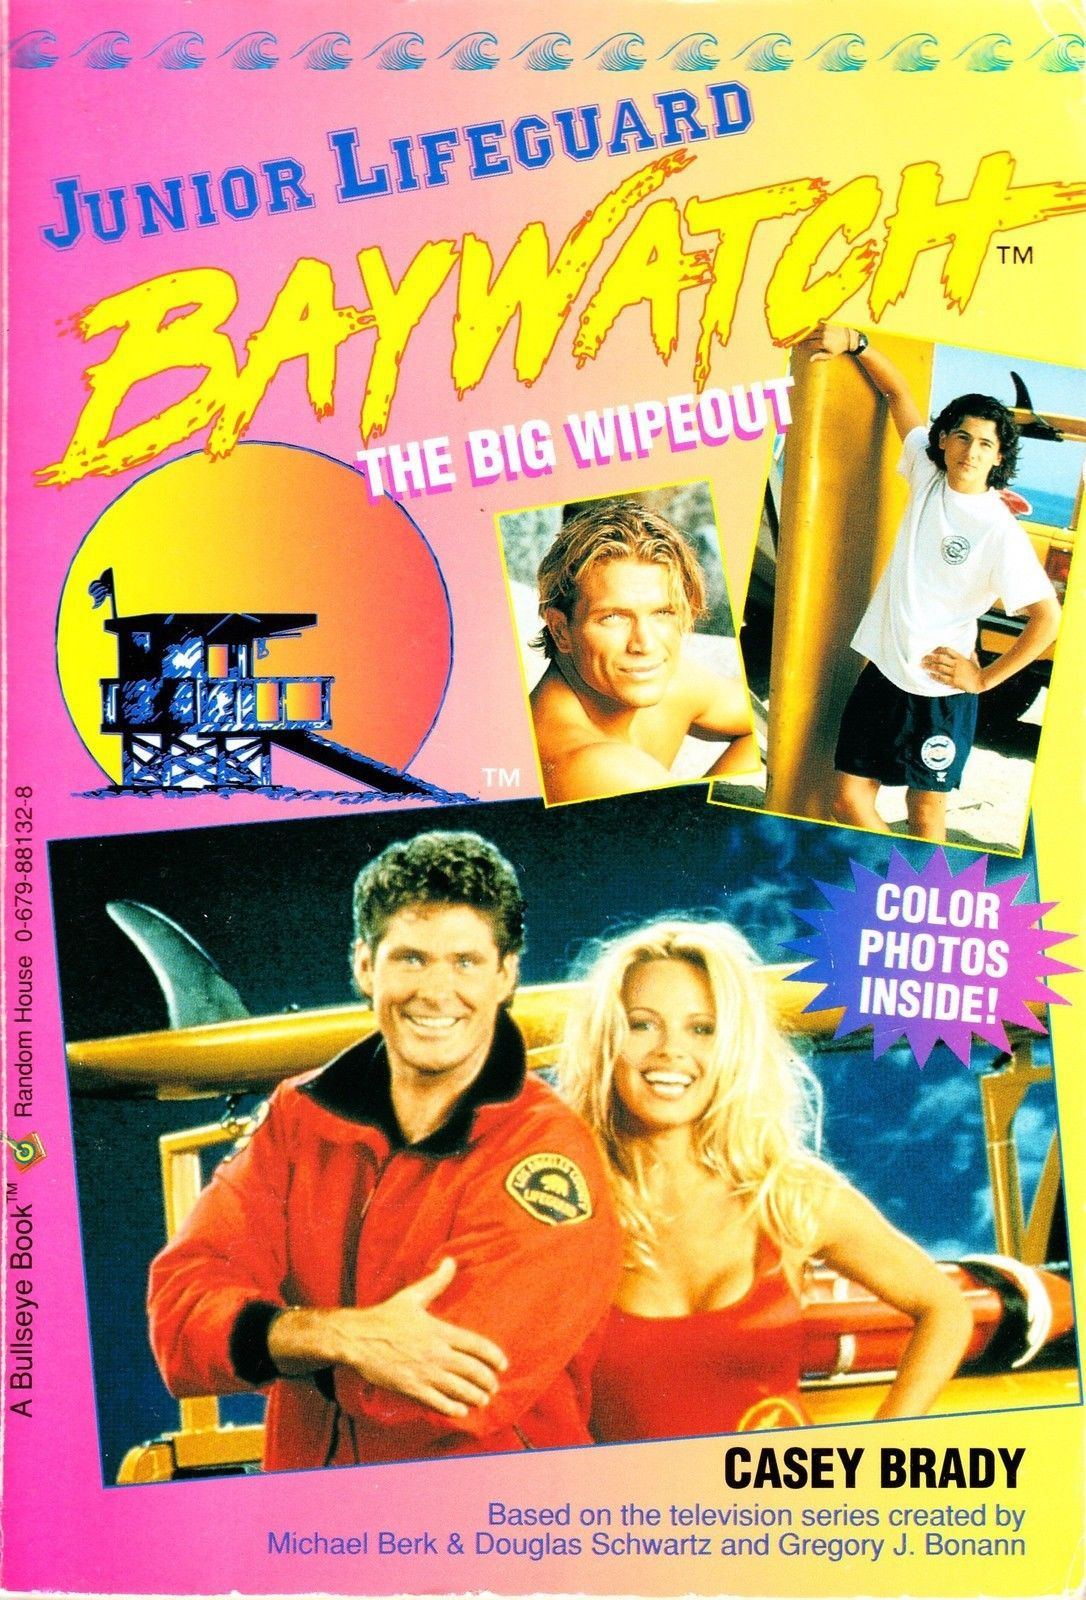 Cover of Baywatch Junior Lifeguard book 4